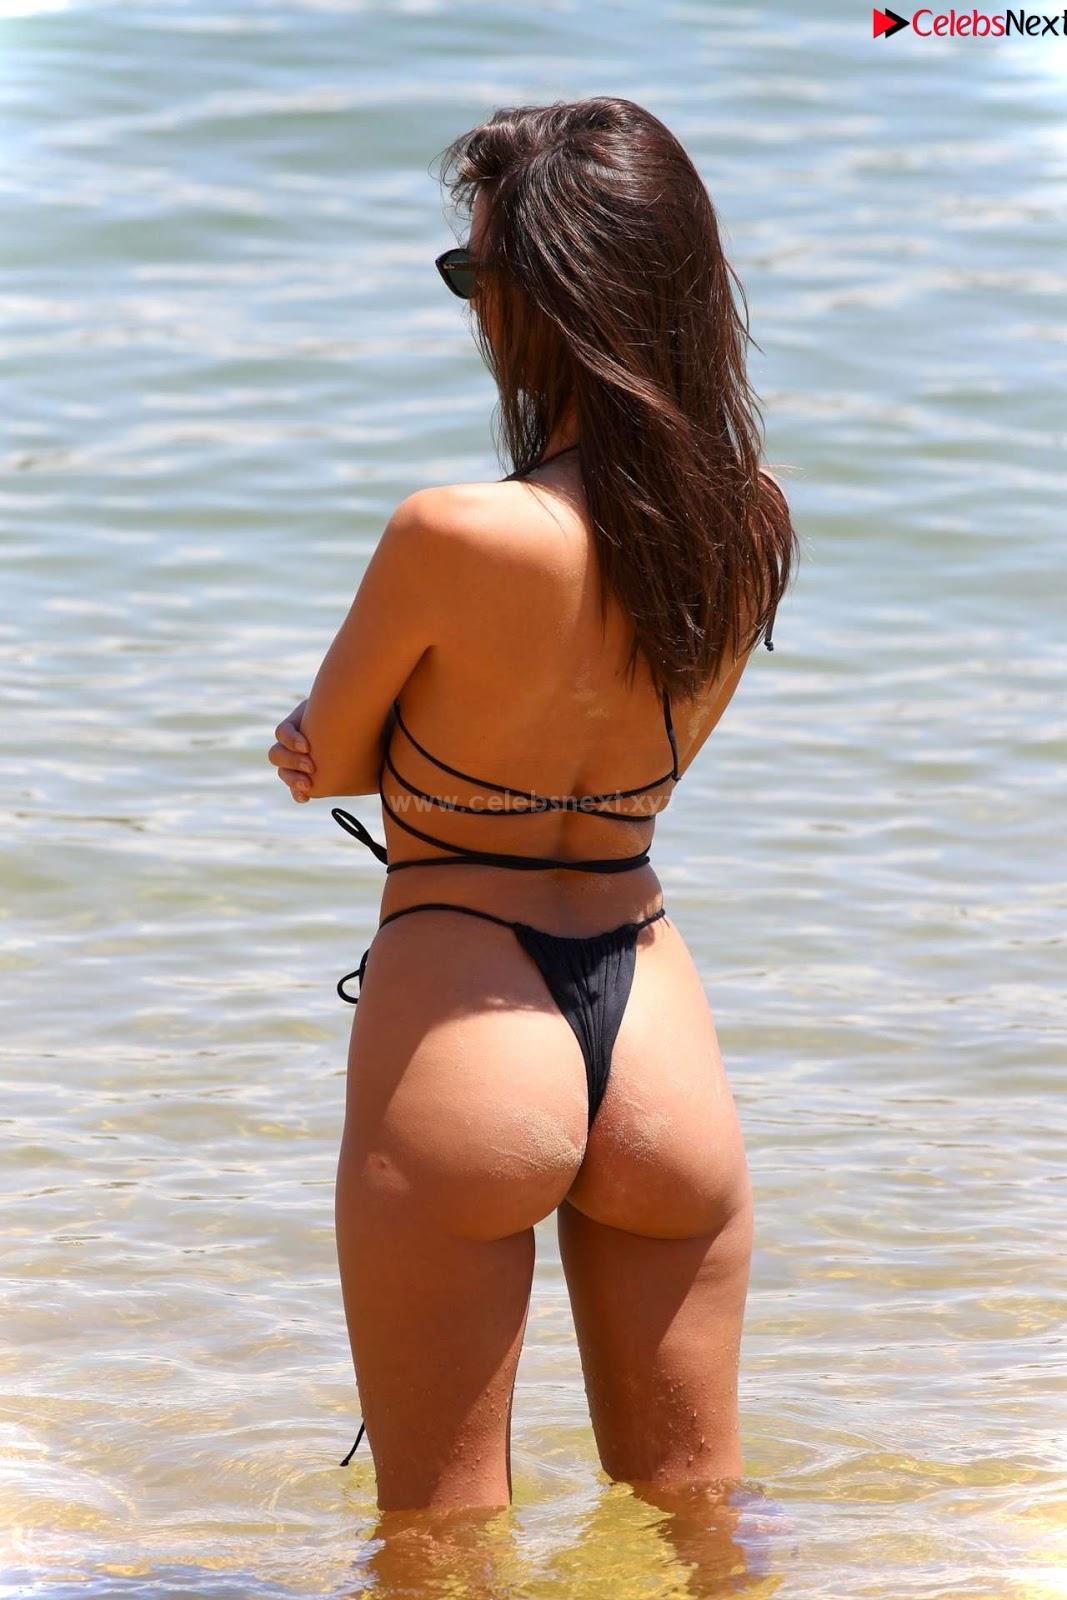 Emily Ratajkowski in Black Thong Bikini Beautiful Ass hot pussy celebritybooty.co Exclusive